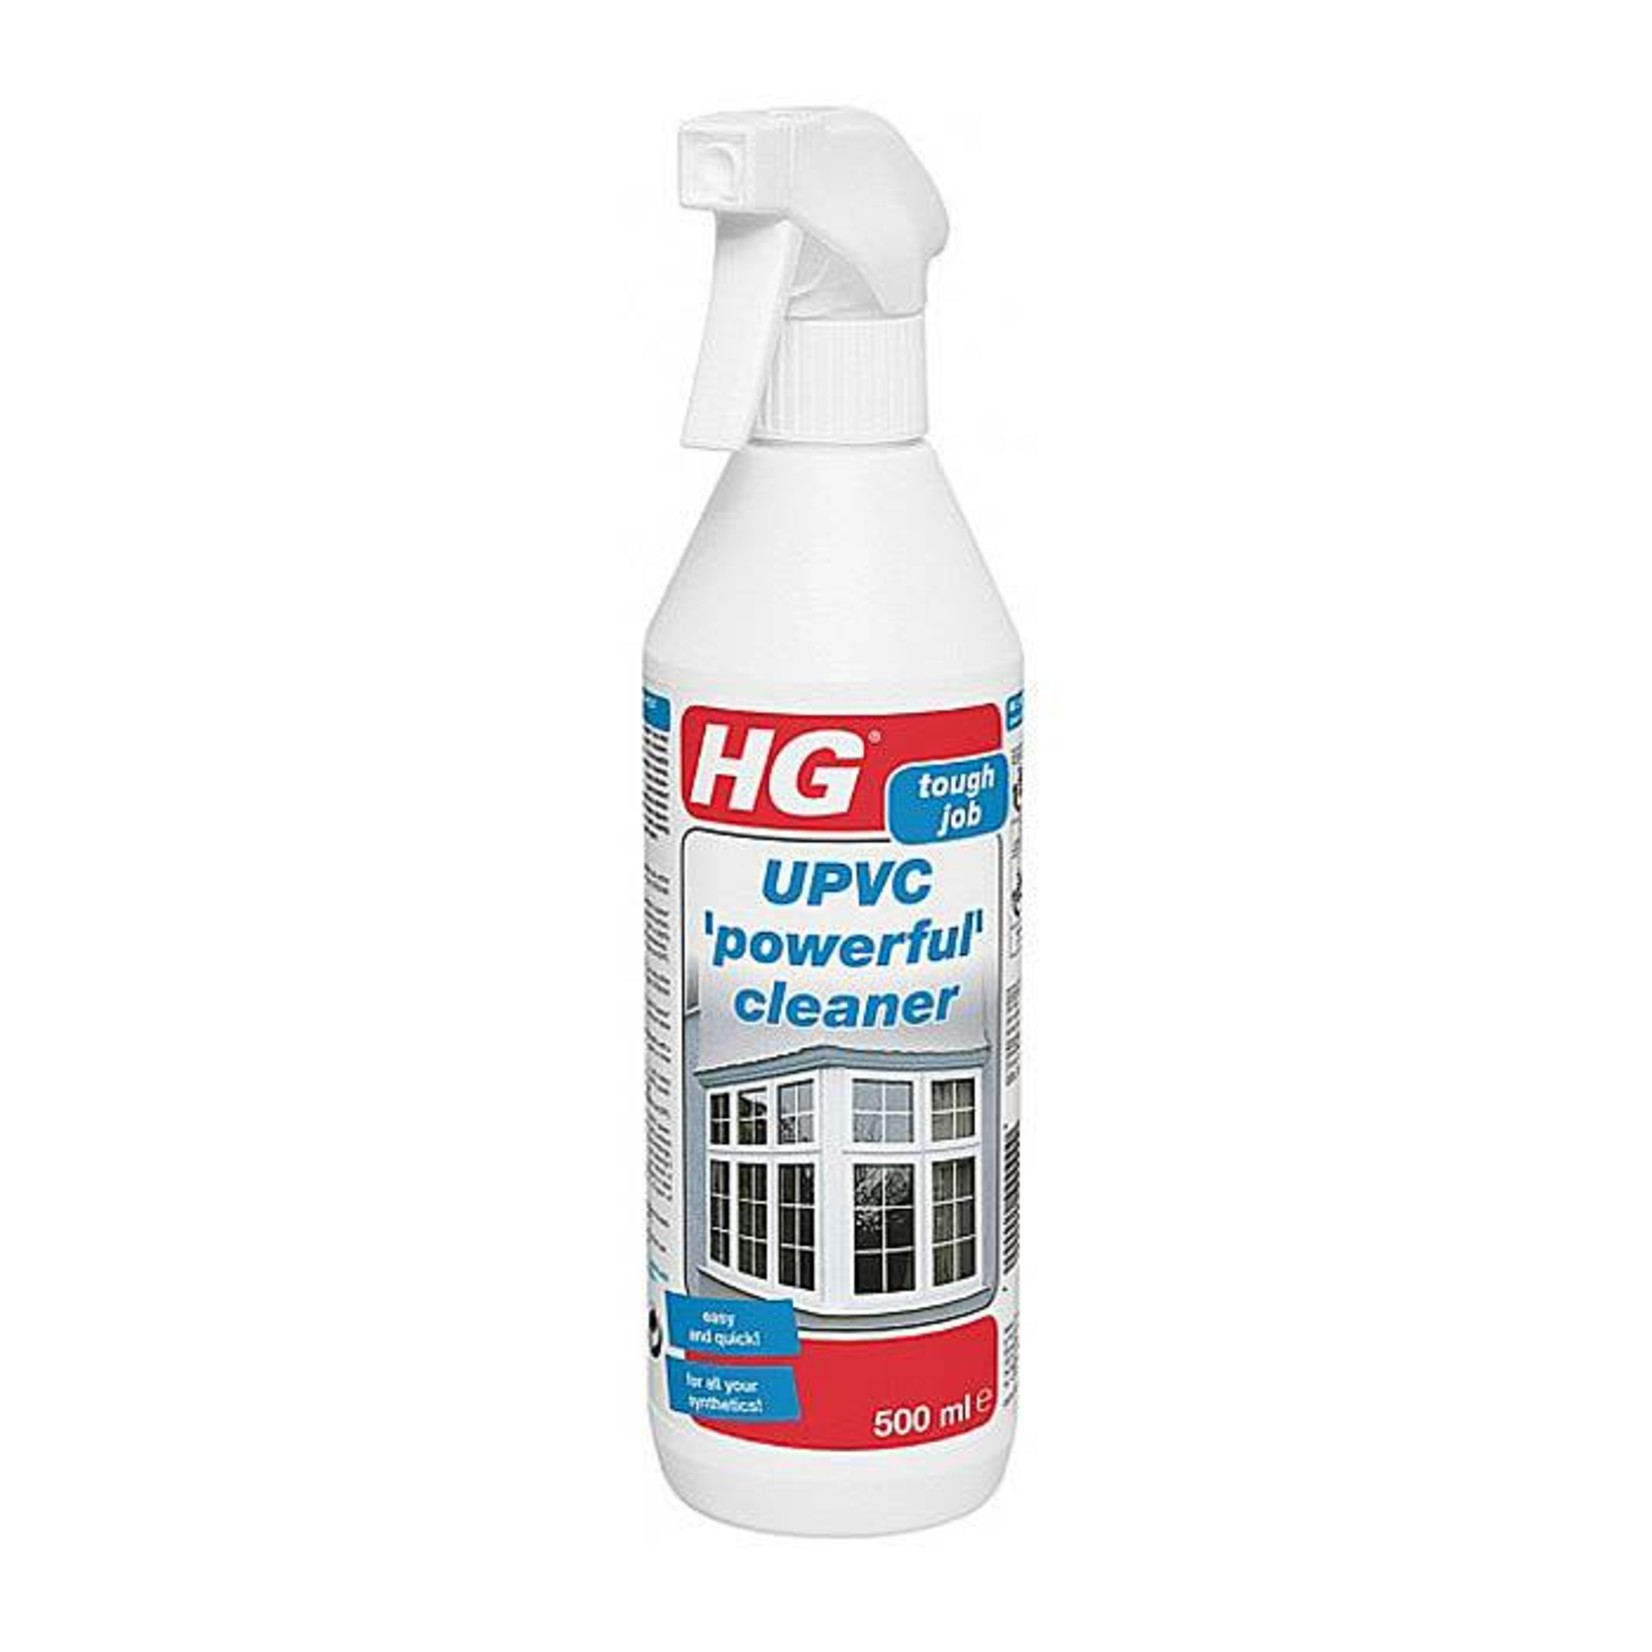 HG HG UPVC POWERFUL CLEANER TOUGH JOB